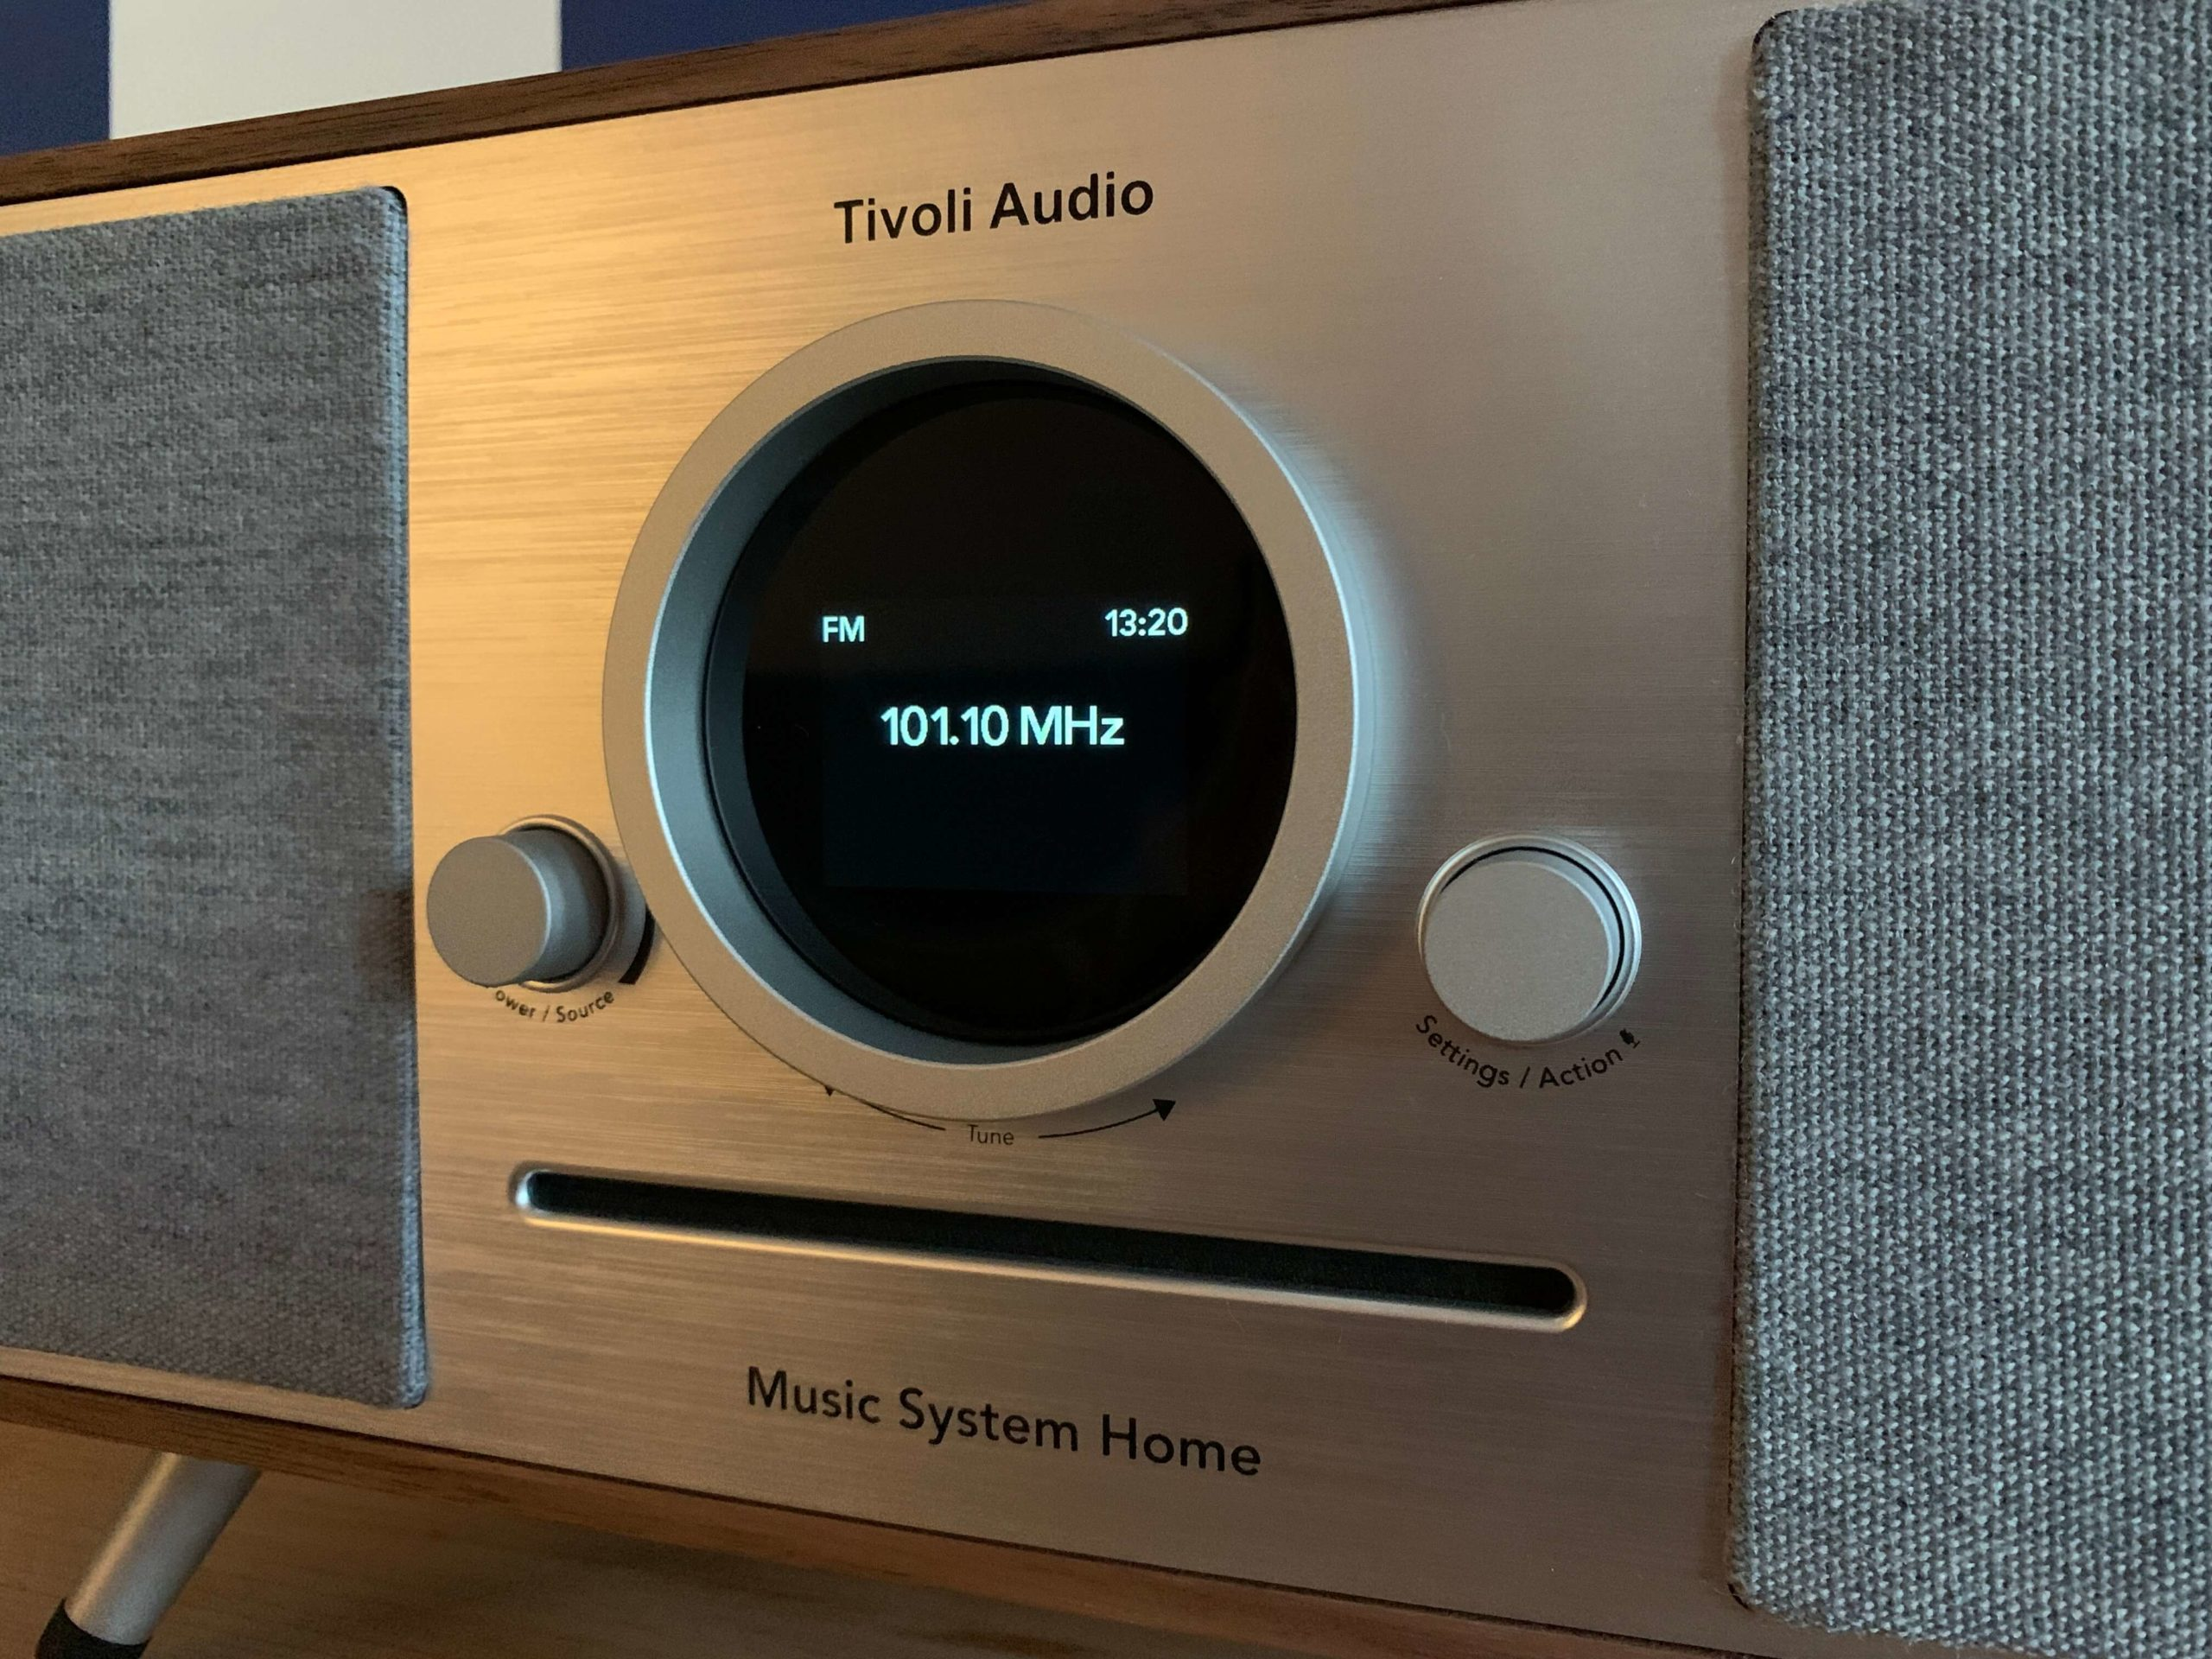 Tivoli Audio Music System Home detal